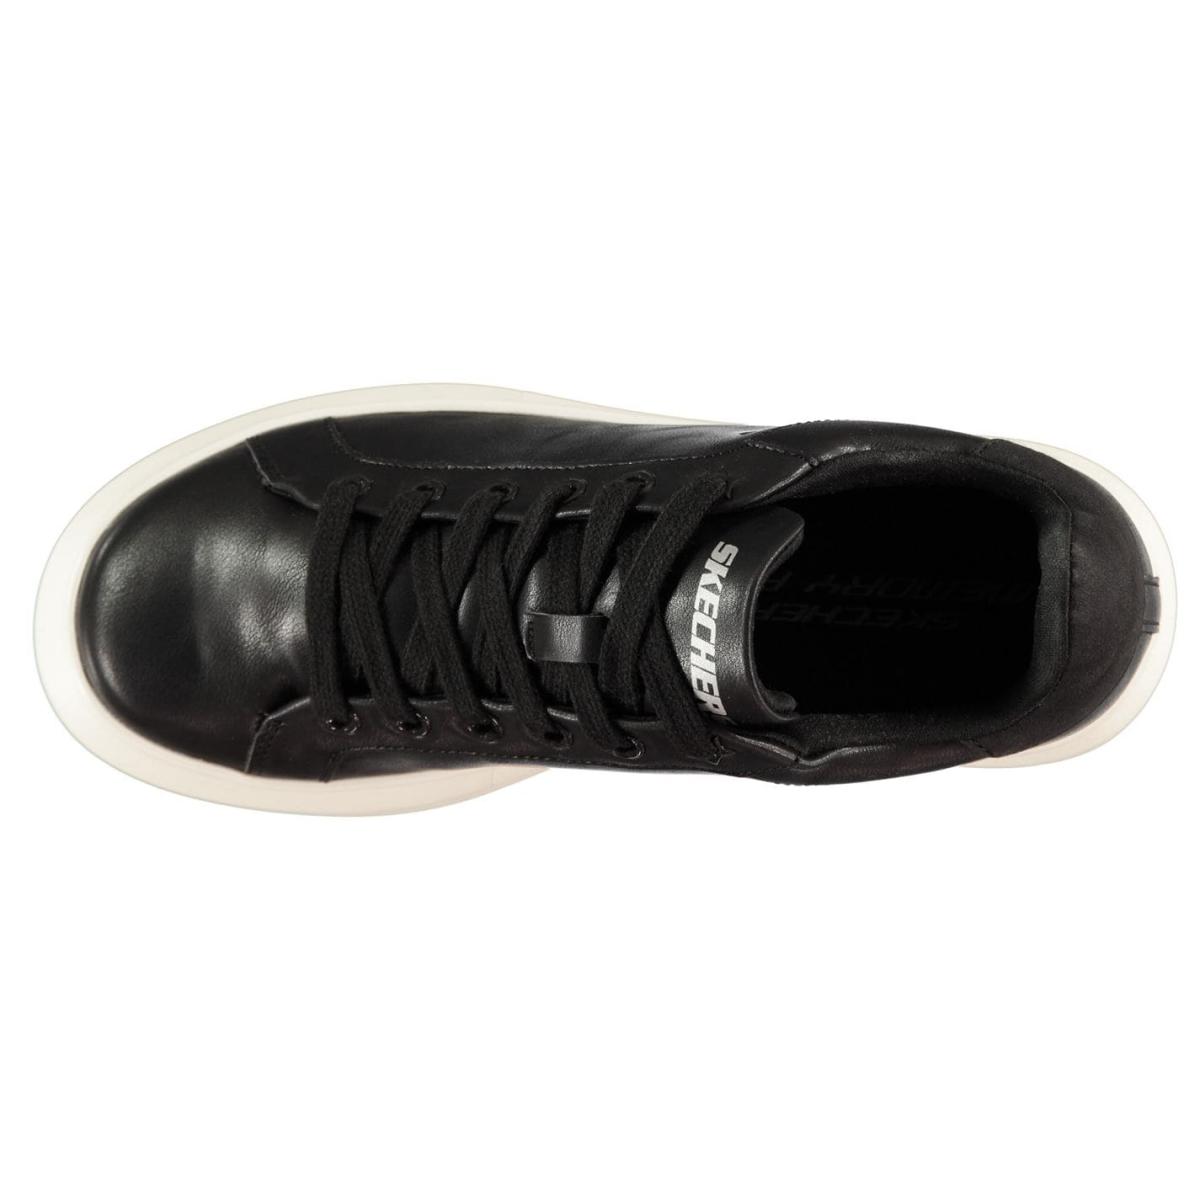 Skechers-Sky-Scraper-Turnschuhe-Damen-Sneaker-Sportschuhe-Laufschuhe-0311 Indexbild 4